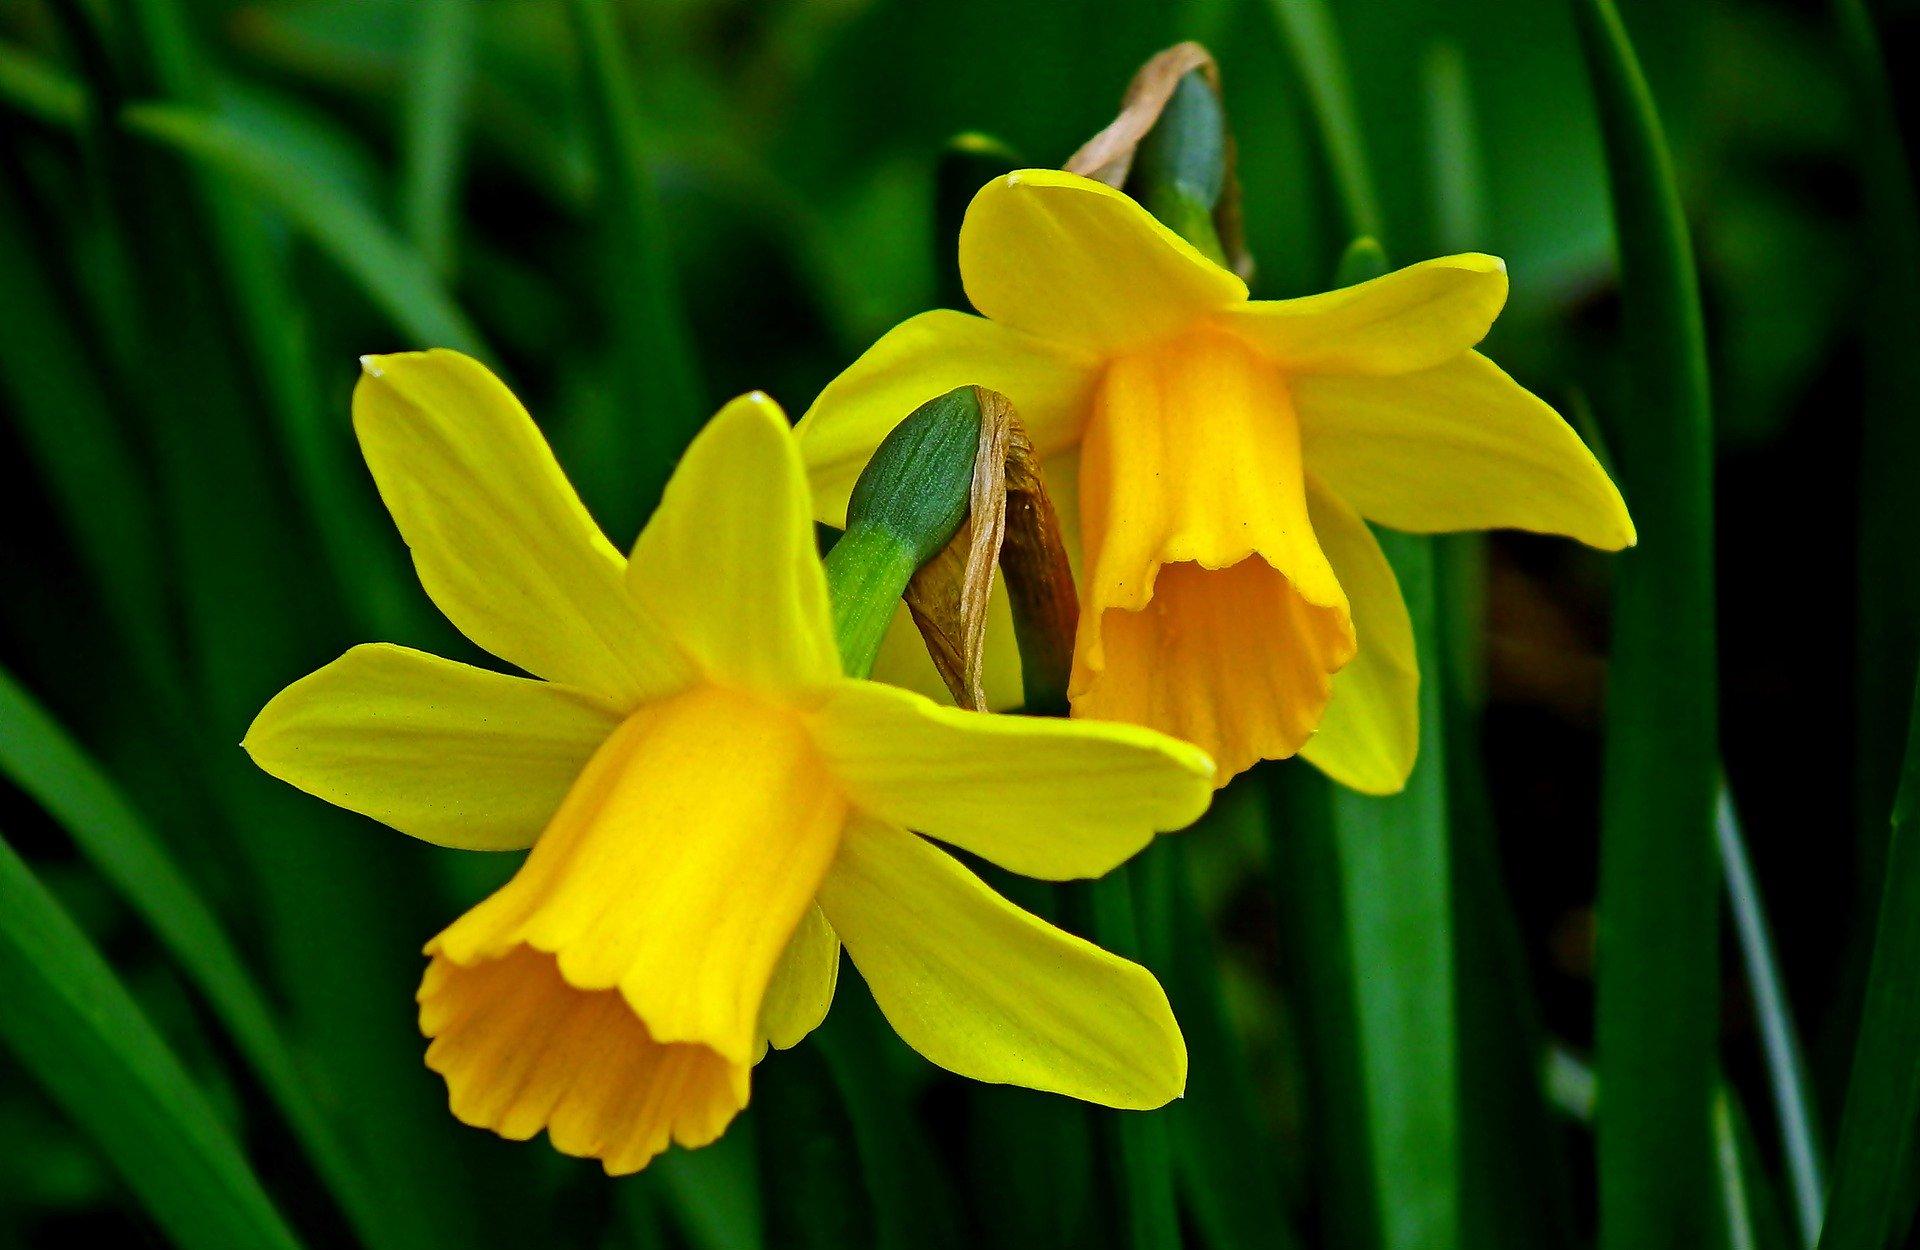 daffodils-4955256_1920